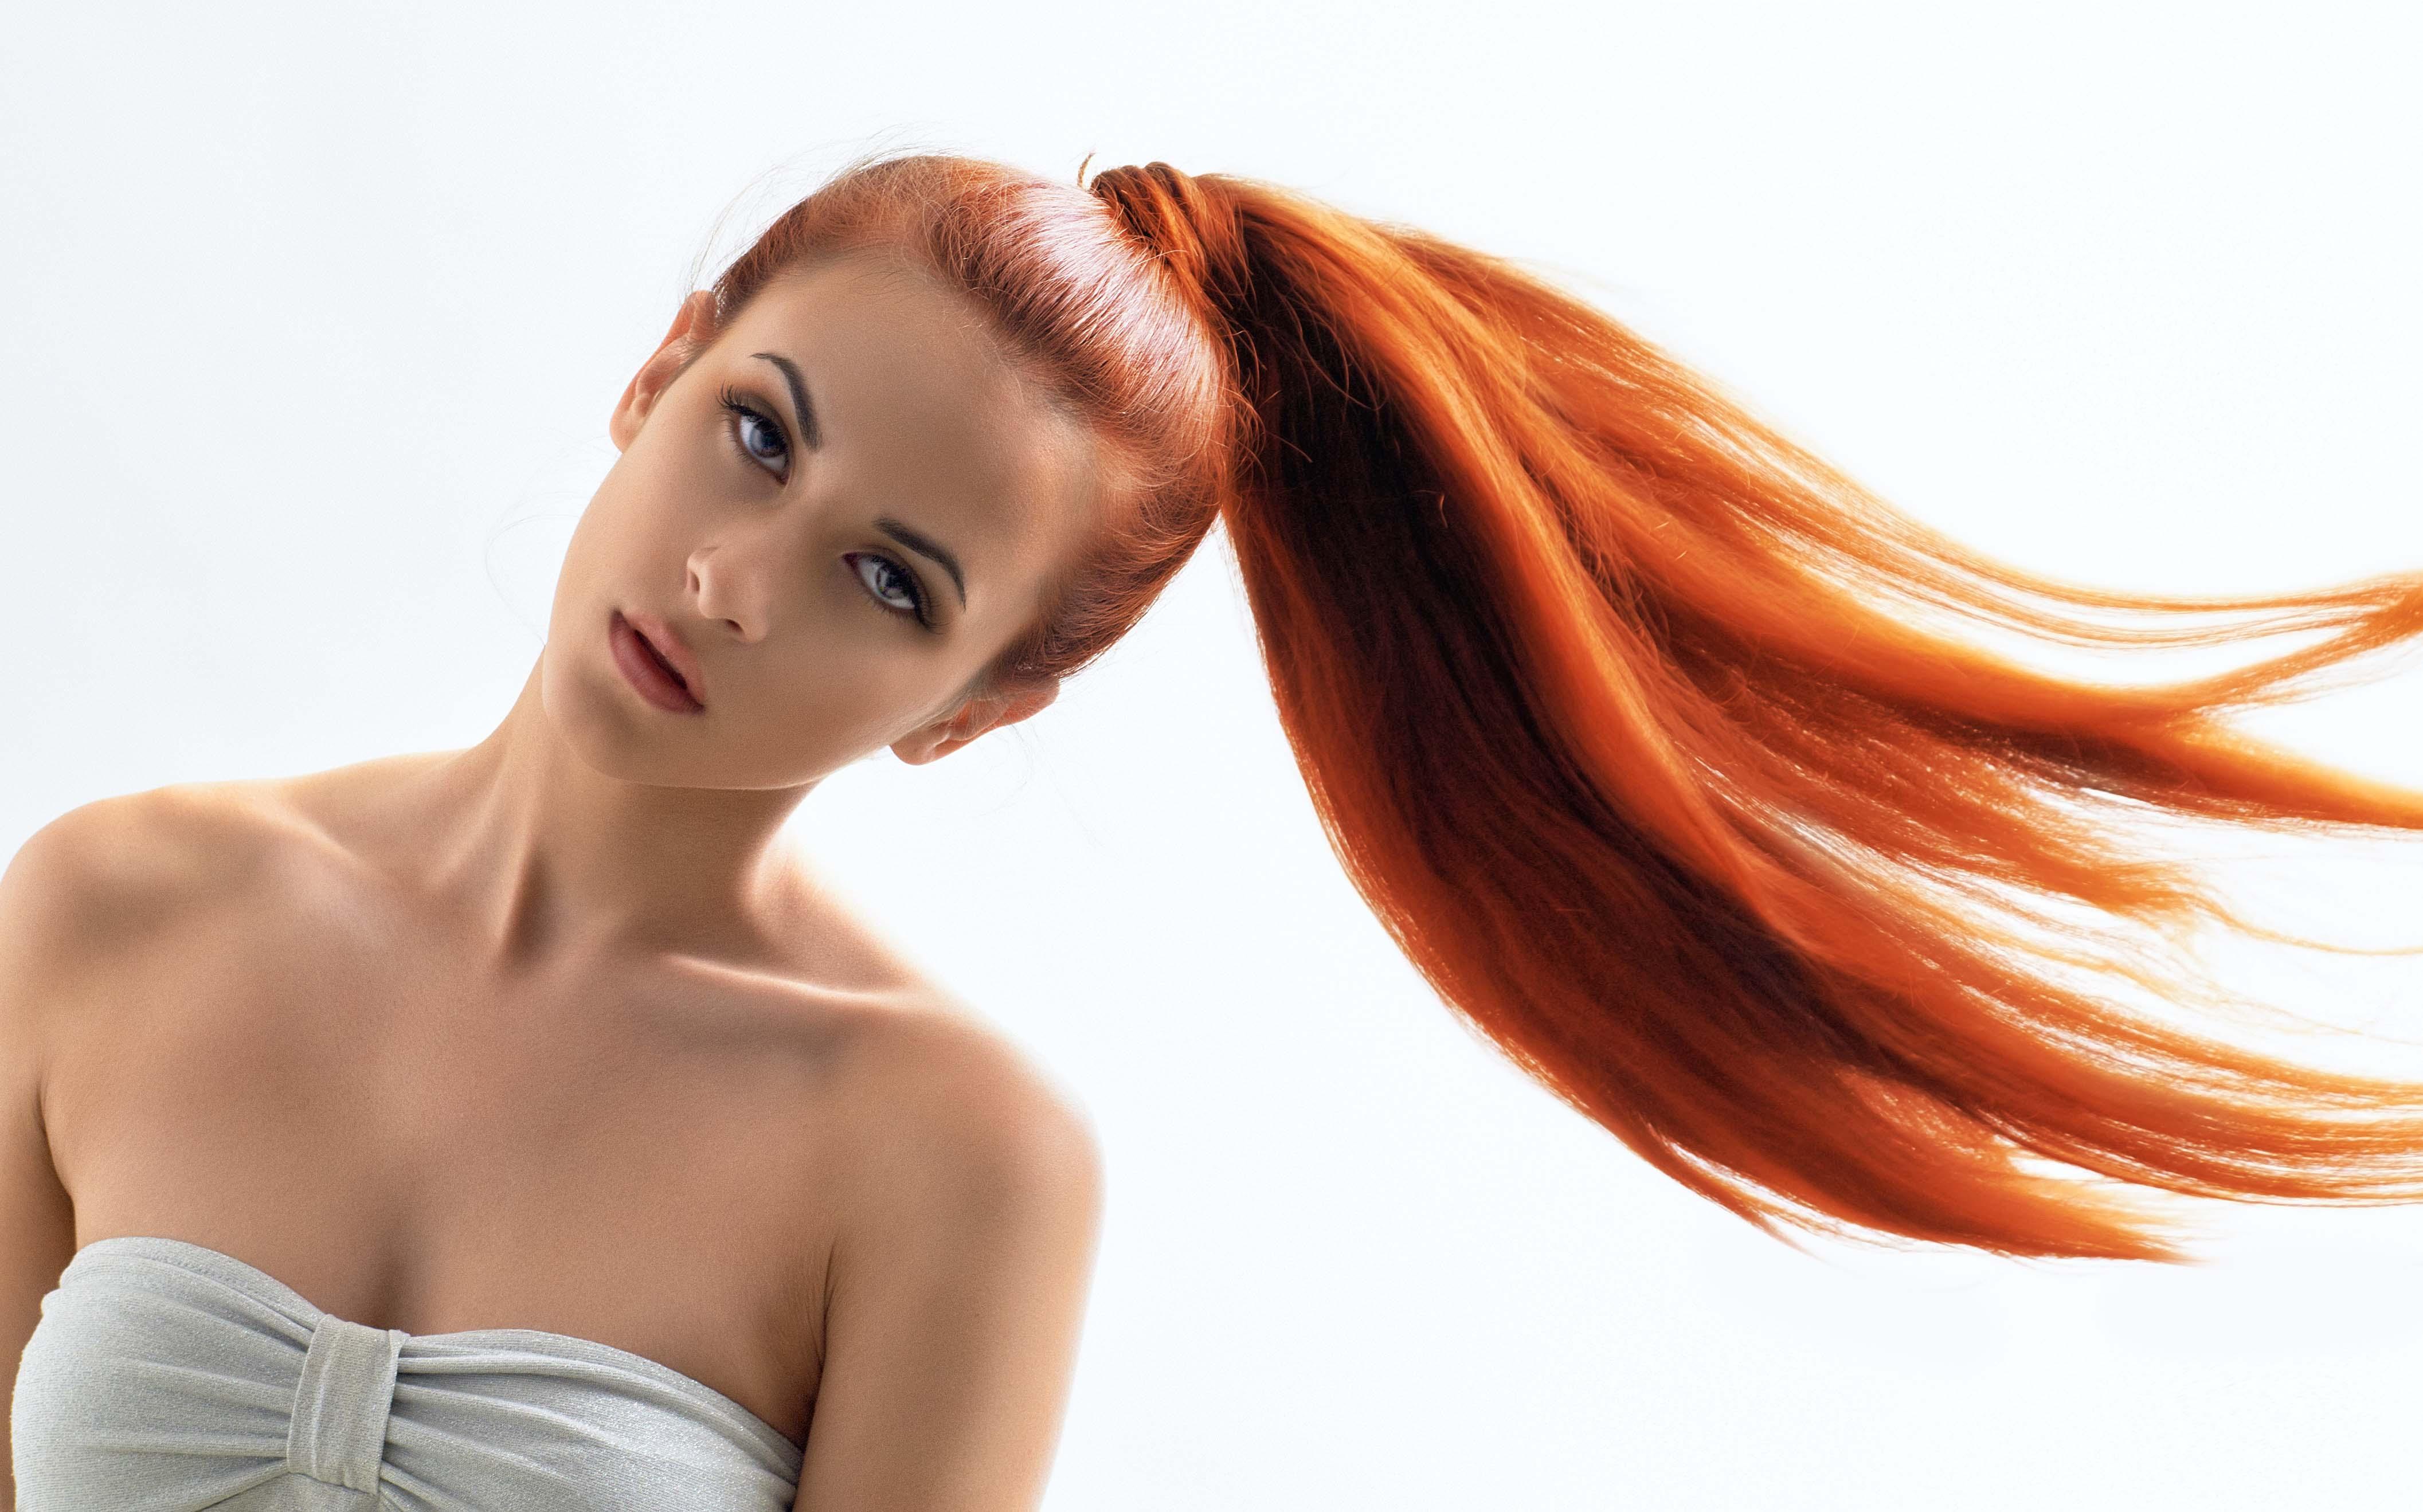 ponytail-primavera-zephir-parrucchieri-ascona-muralto